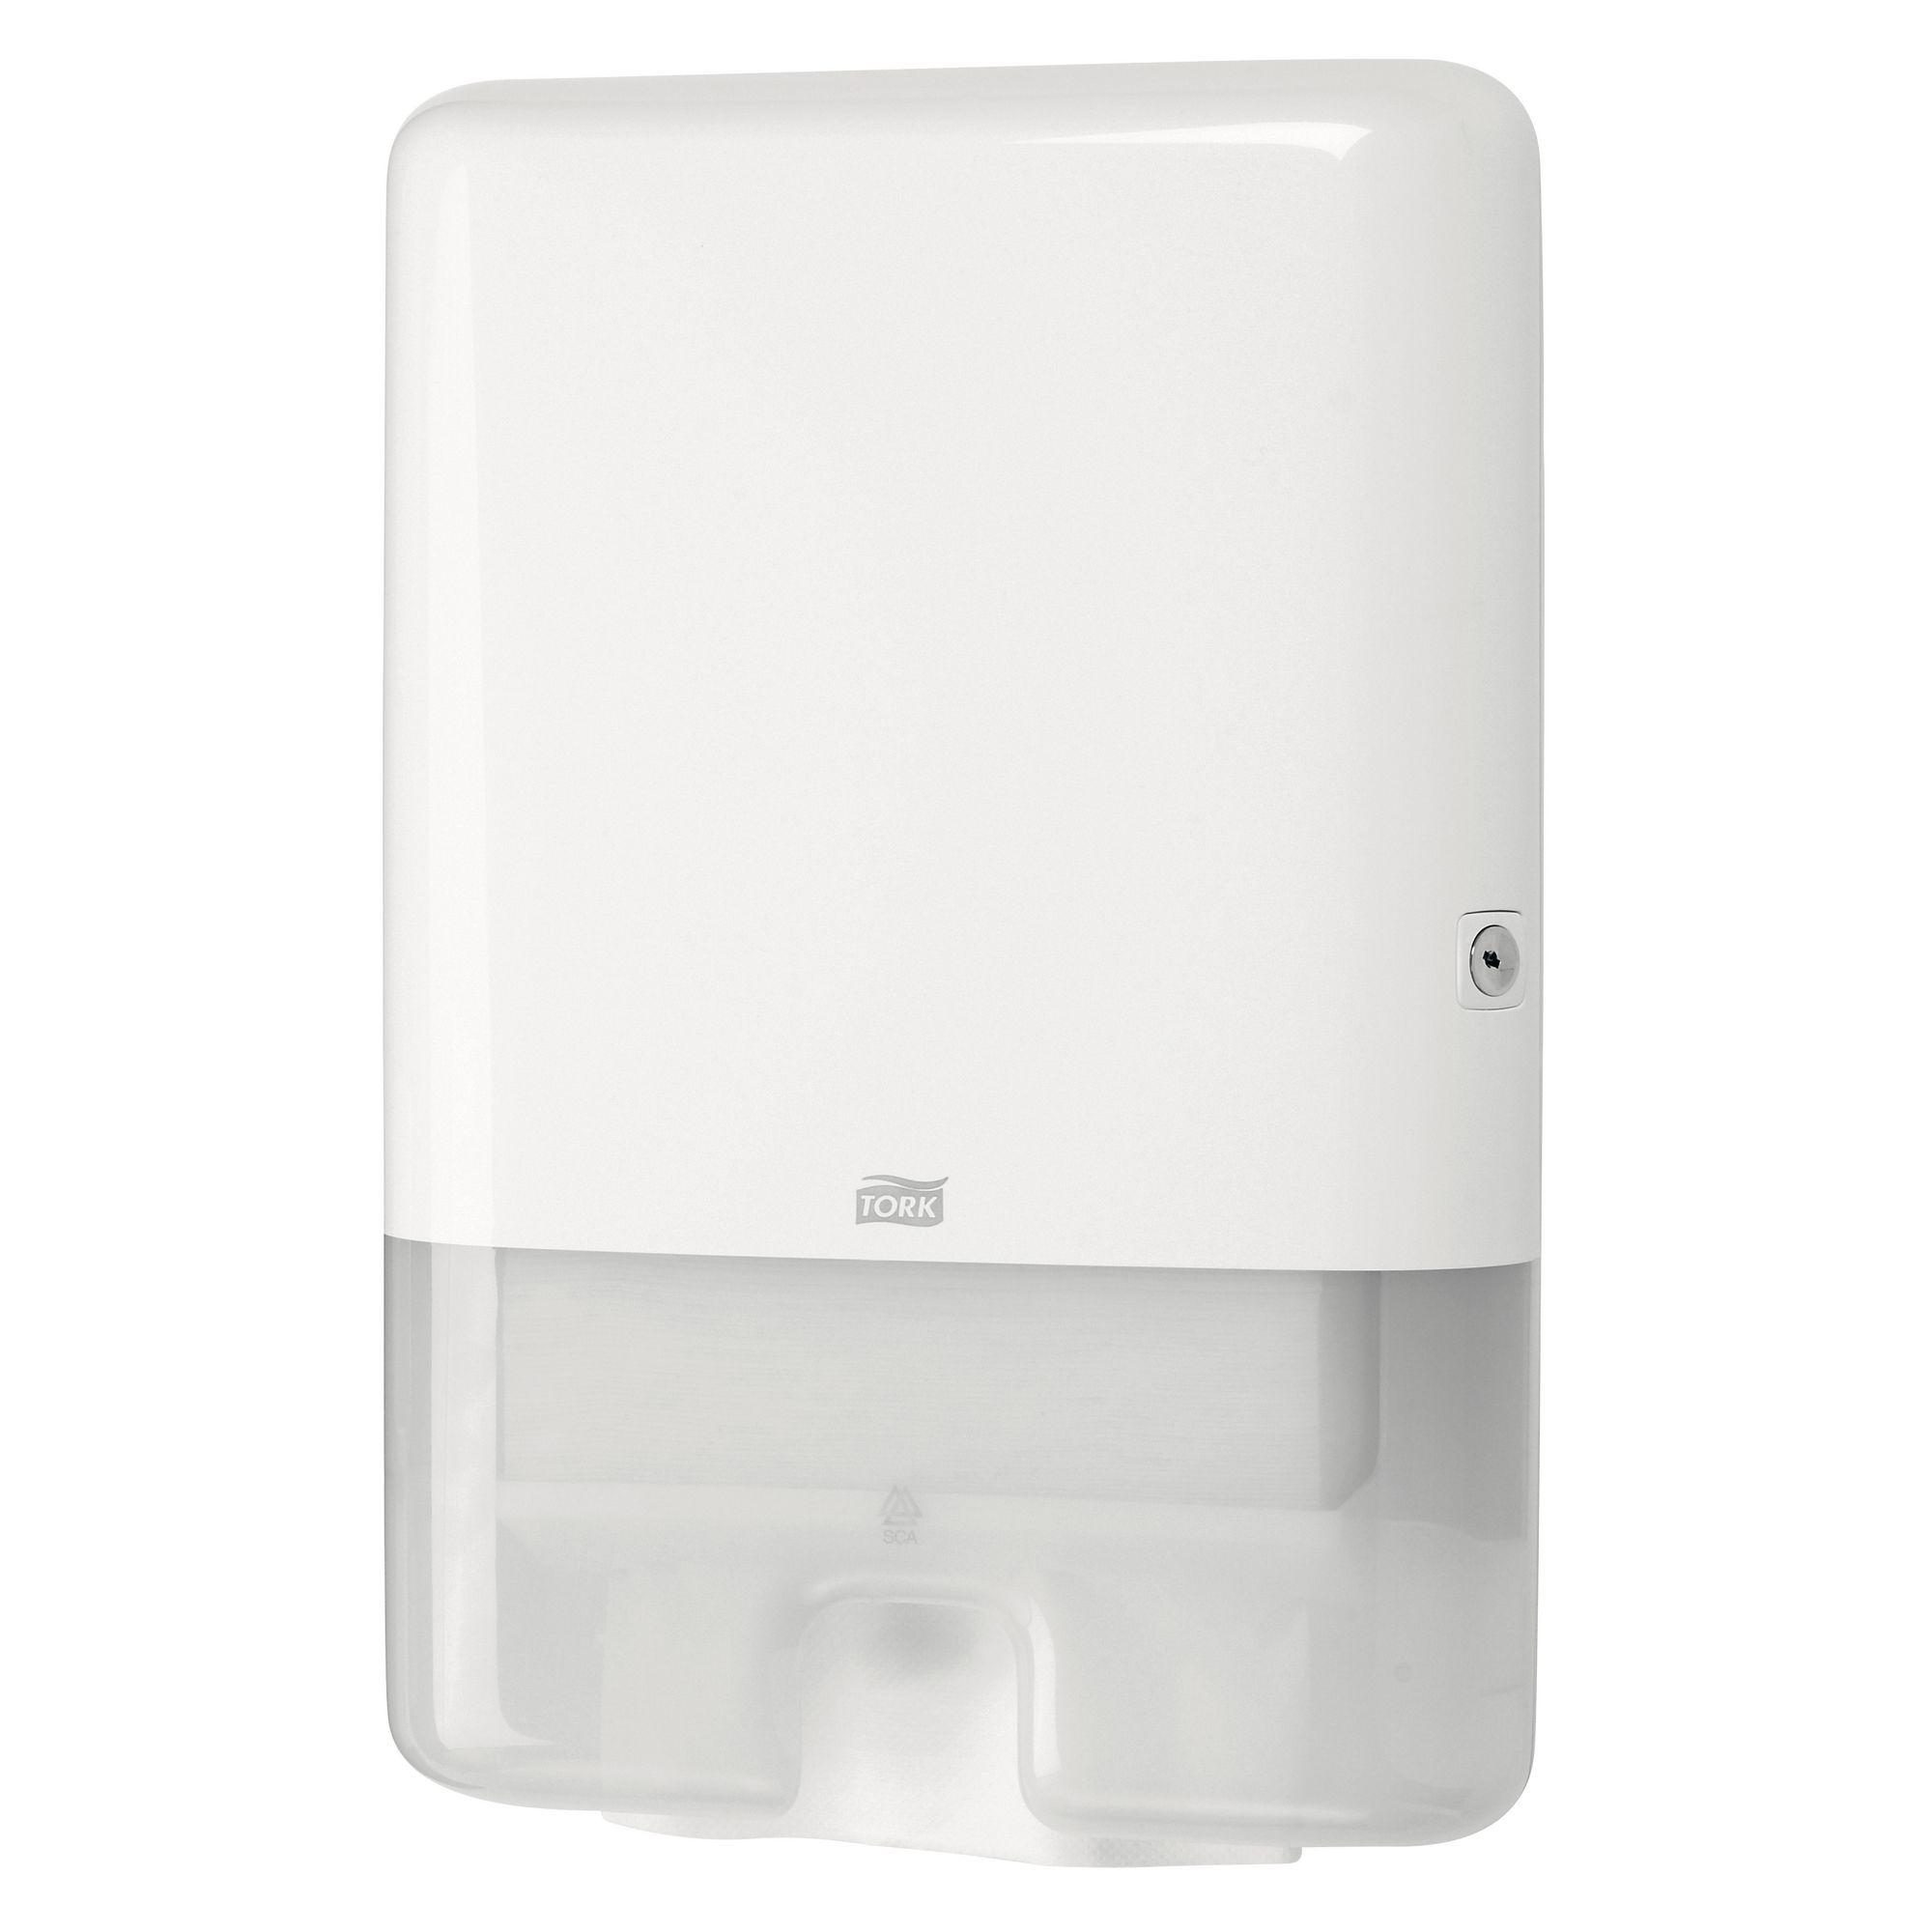 TorkXpress Multifold Handtowel Dispenser